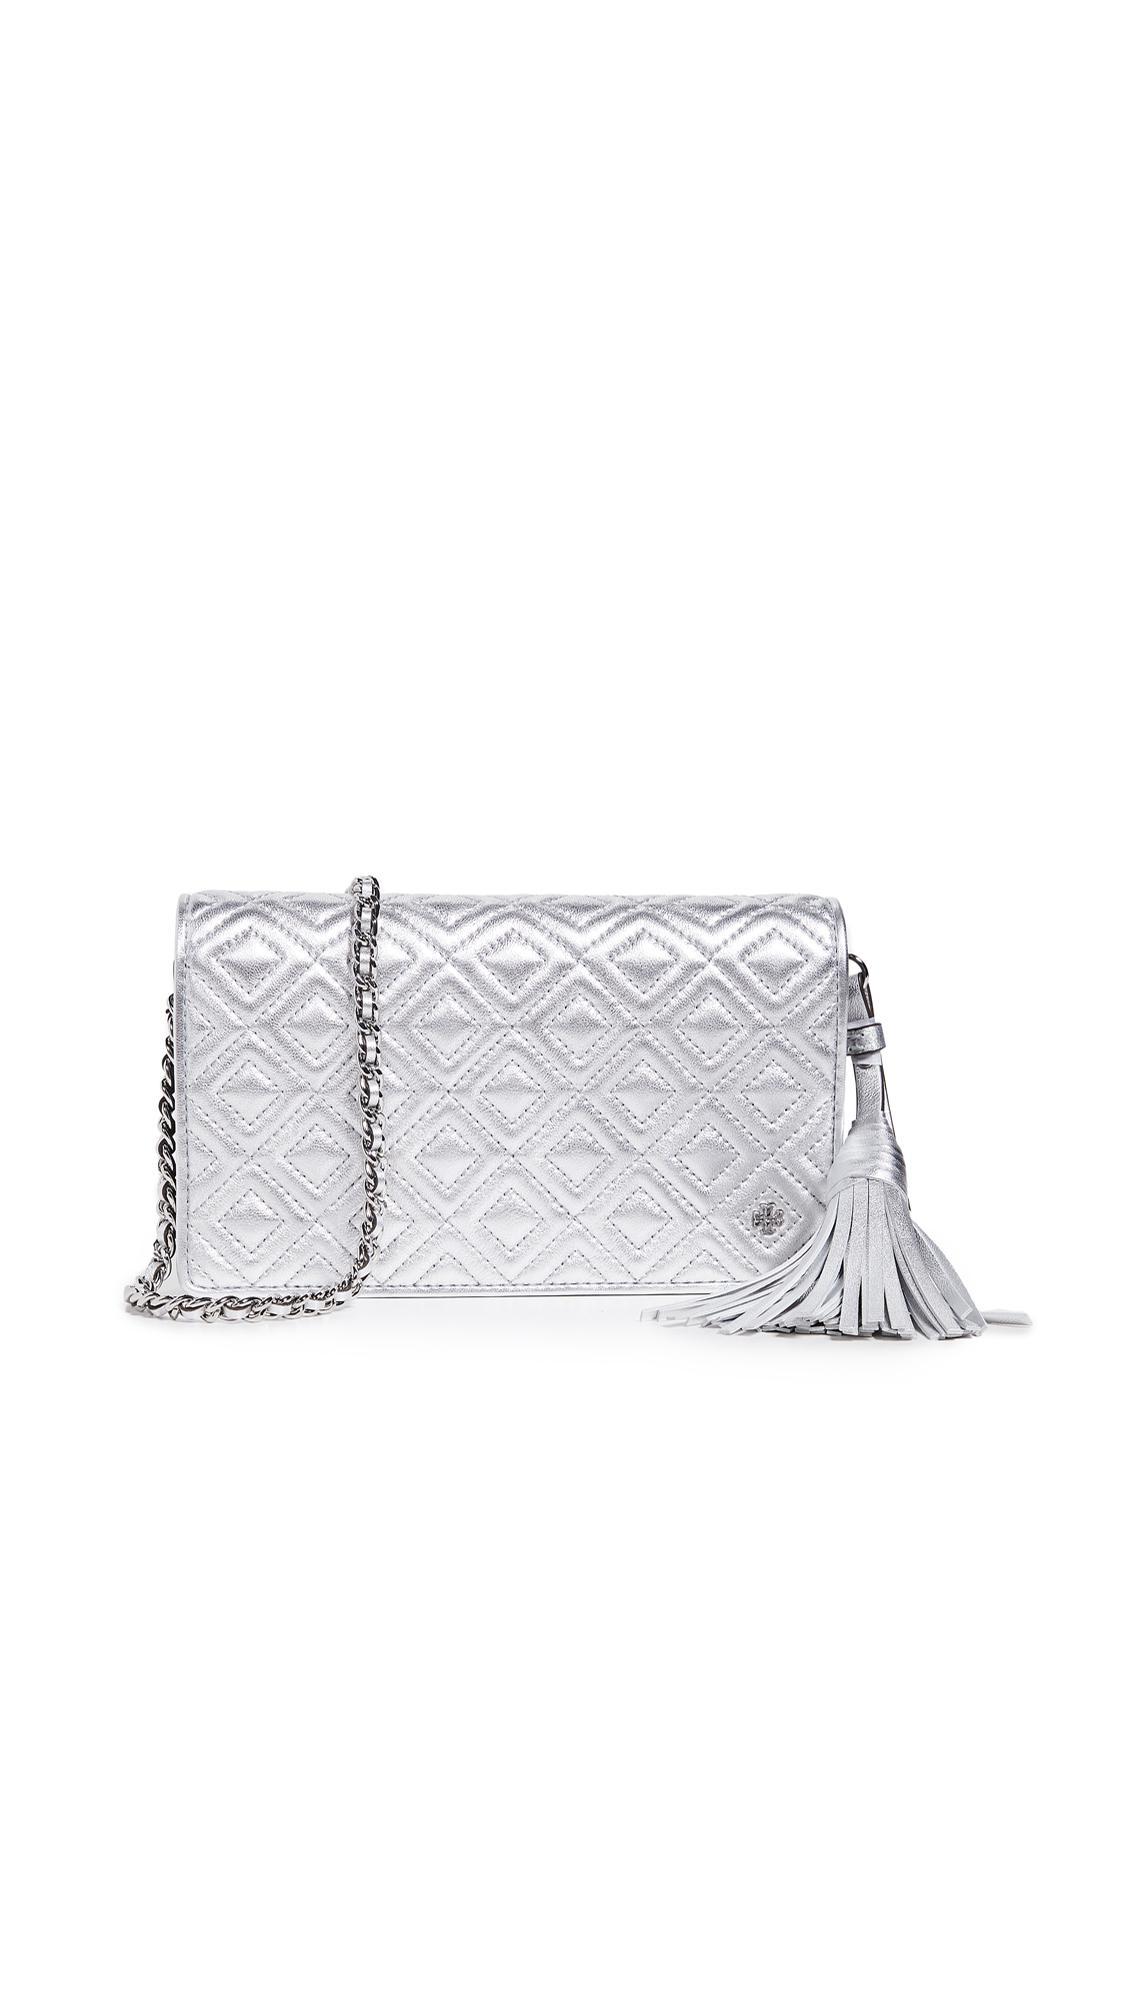 f5bd7b25ad6e Lyst - Tory Burch Fleming Metallic Flat Wallet Crossbody Bag in Metallic